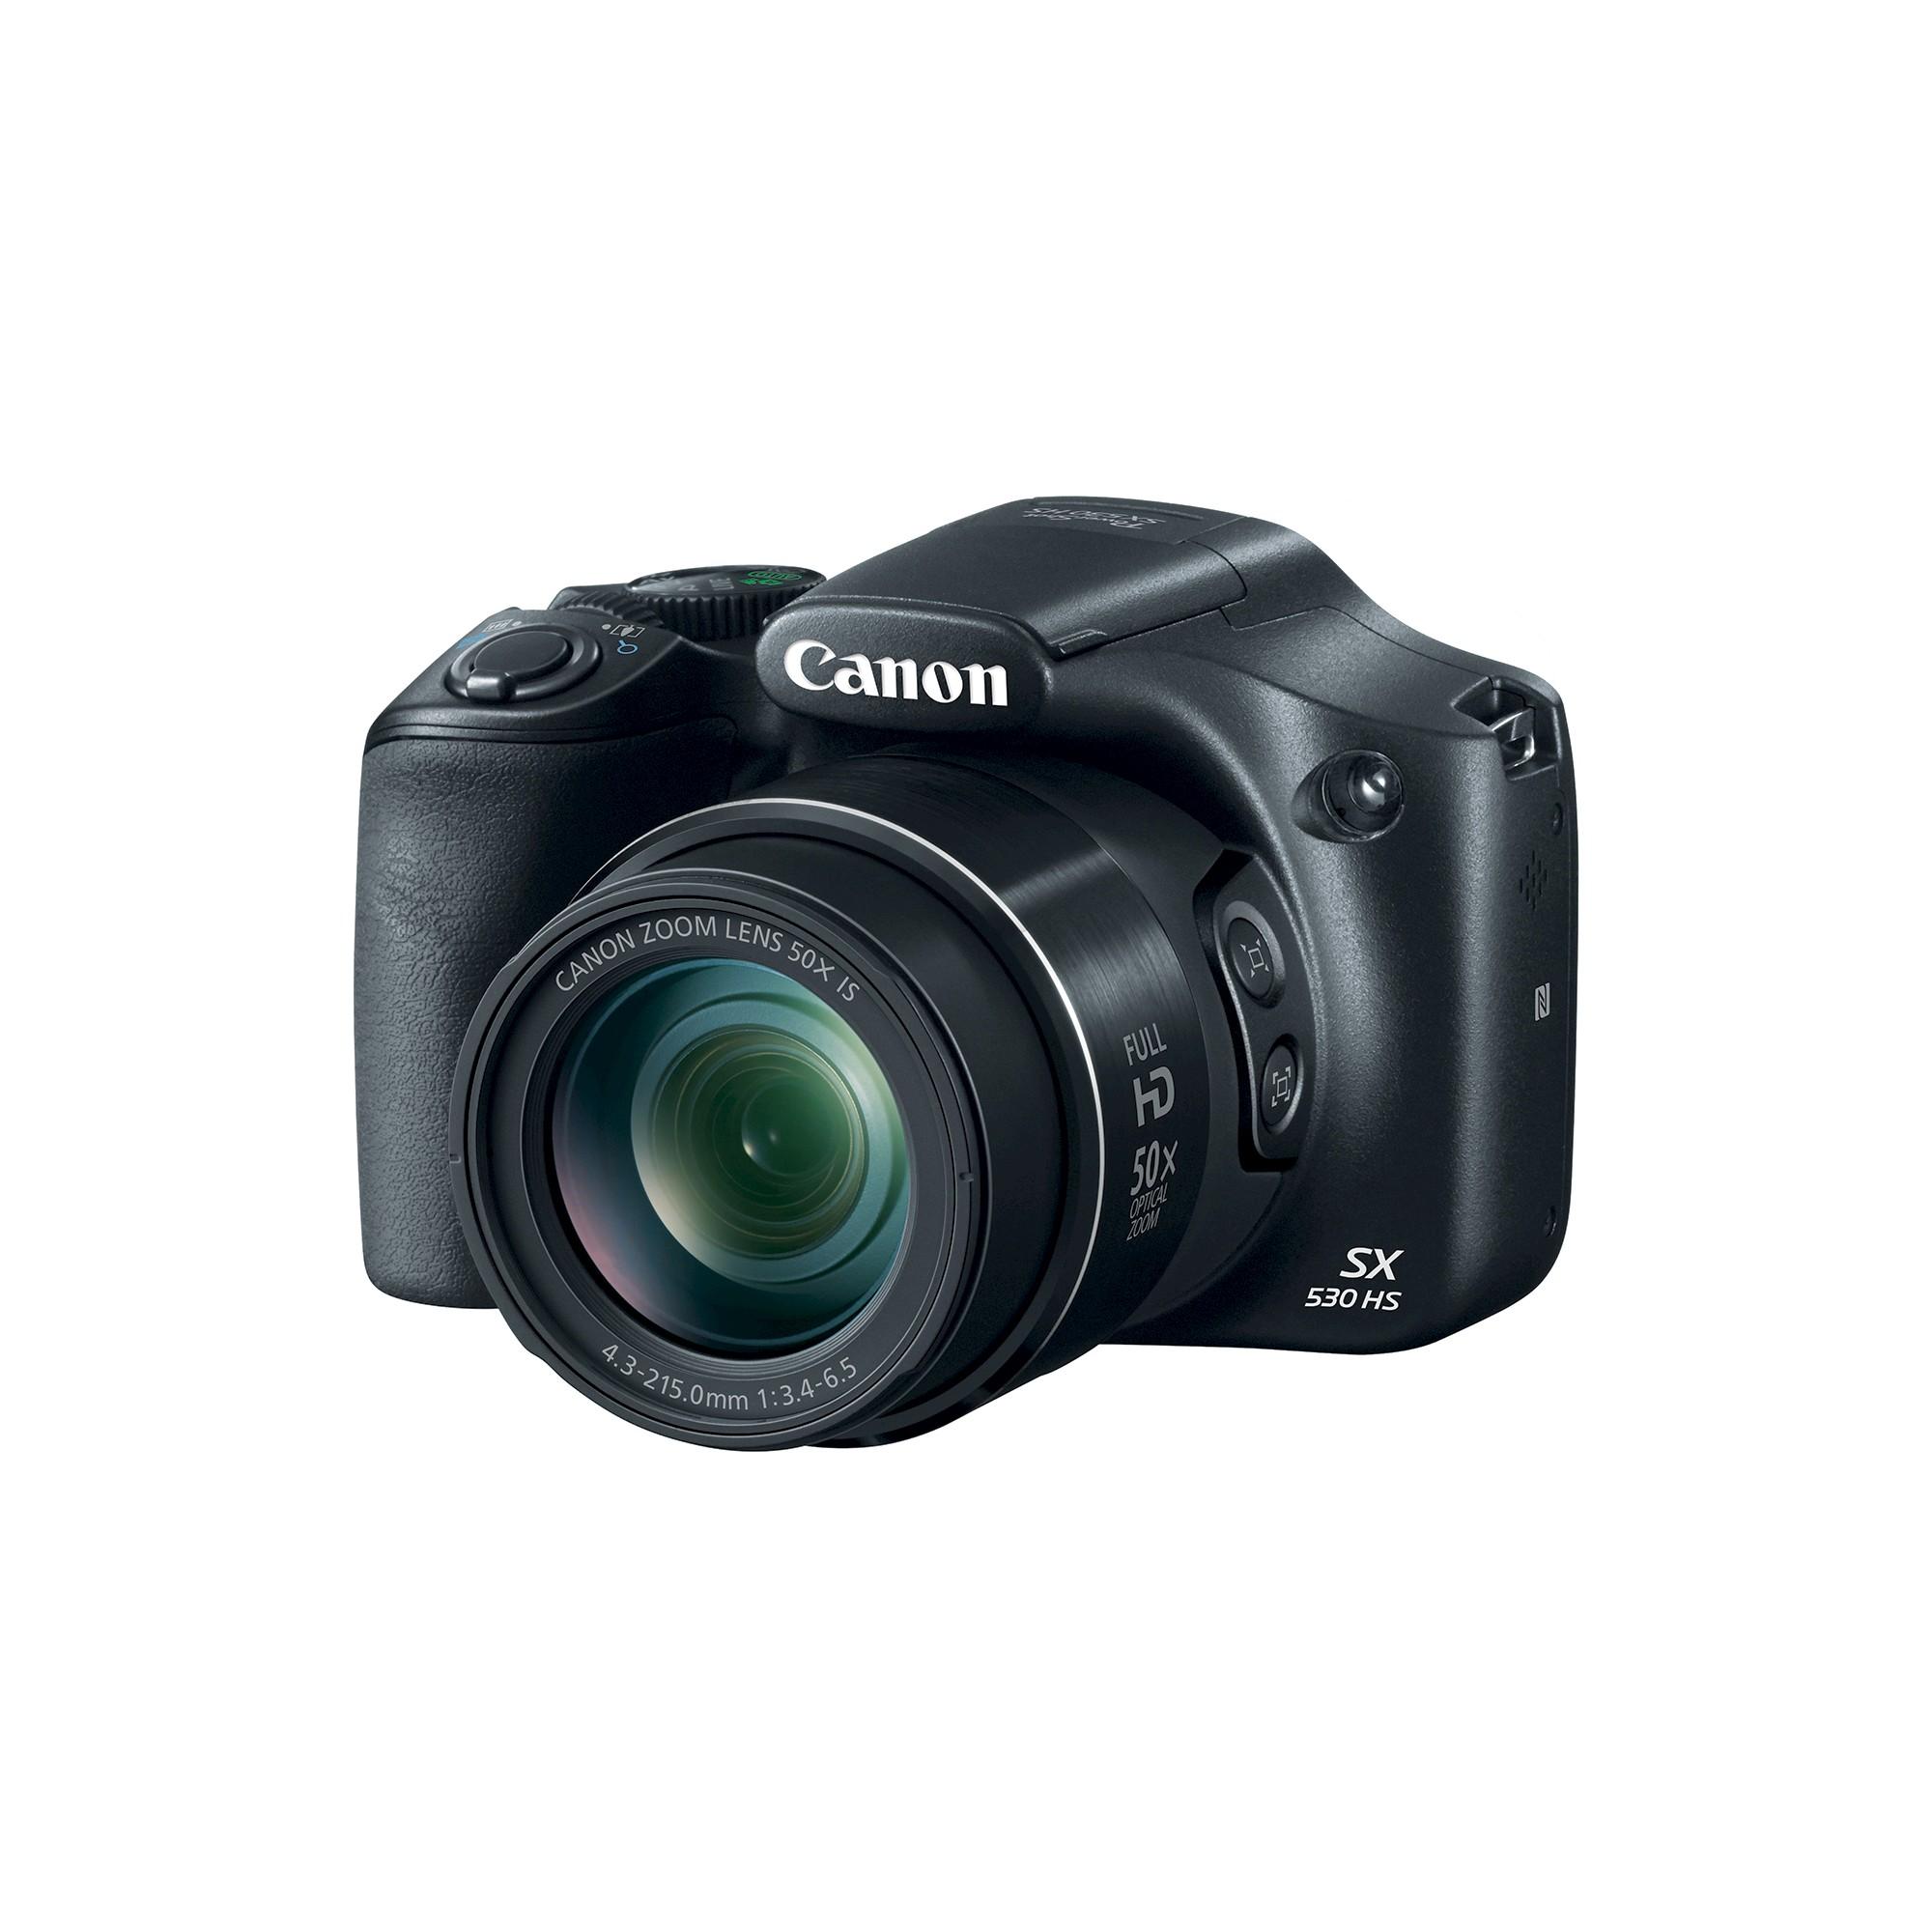 CANON PowerShot SX530 HS, digital cameras Best digital